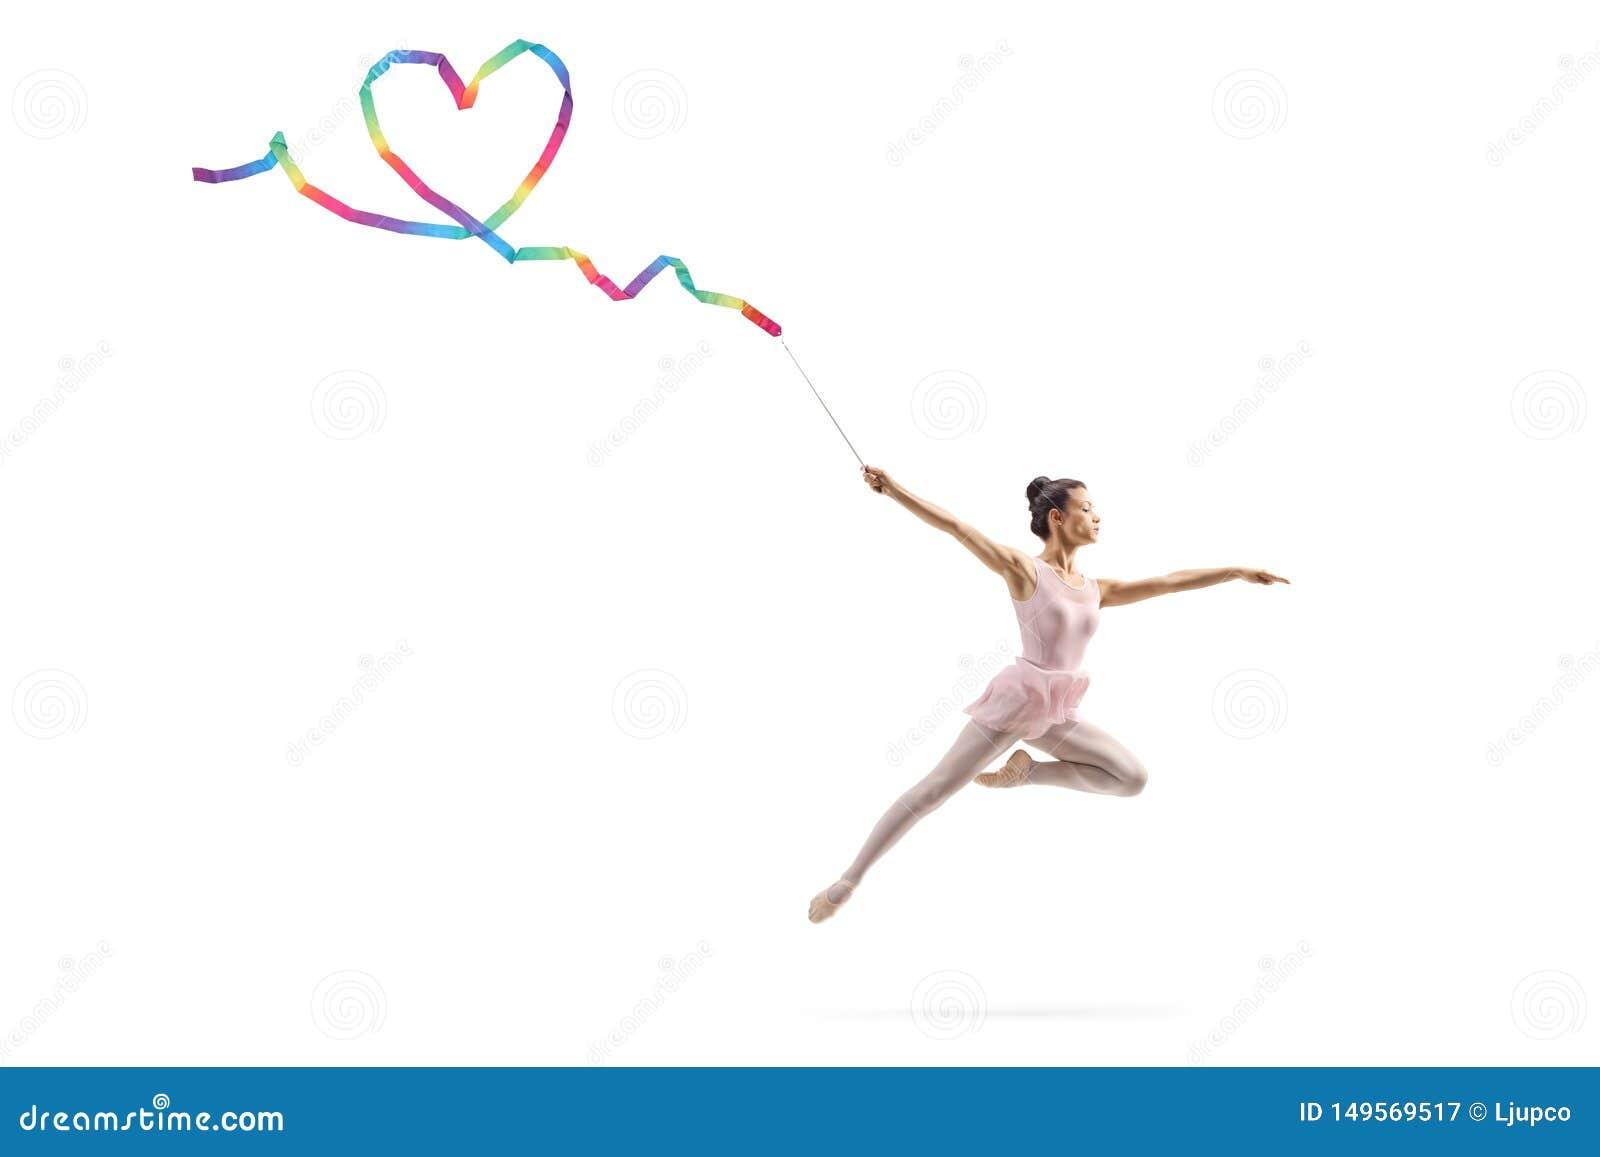 Female gymnast making a heart shape with a ribbon